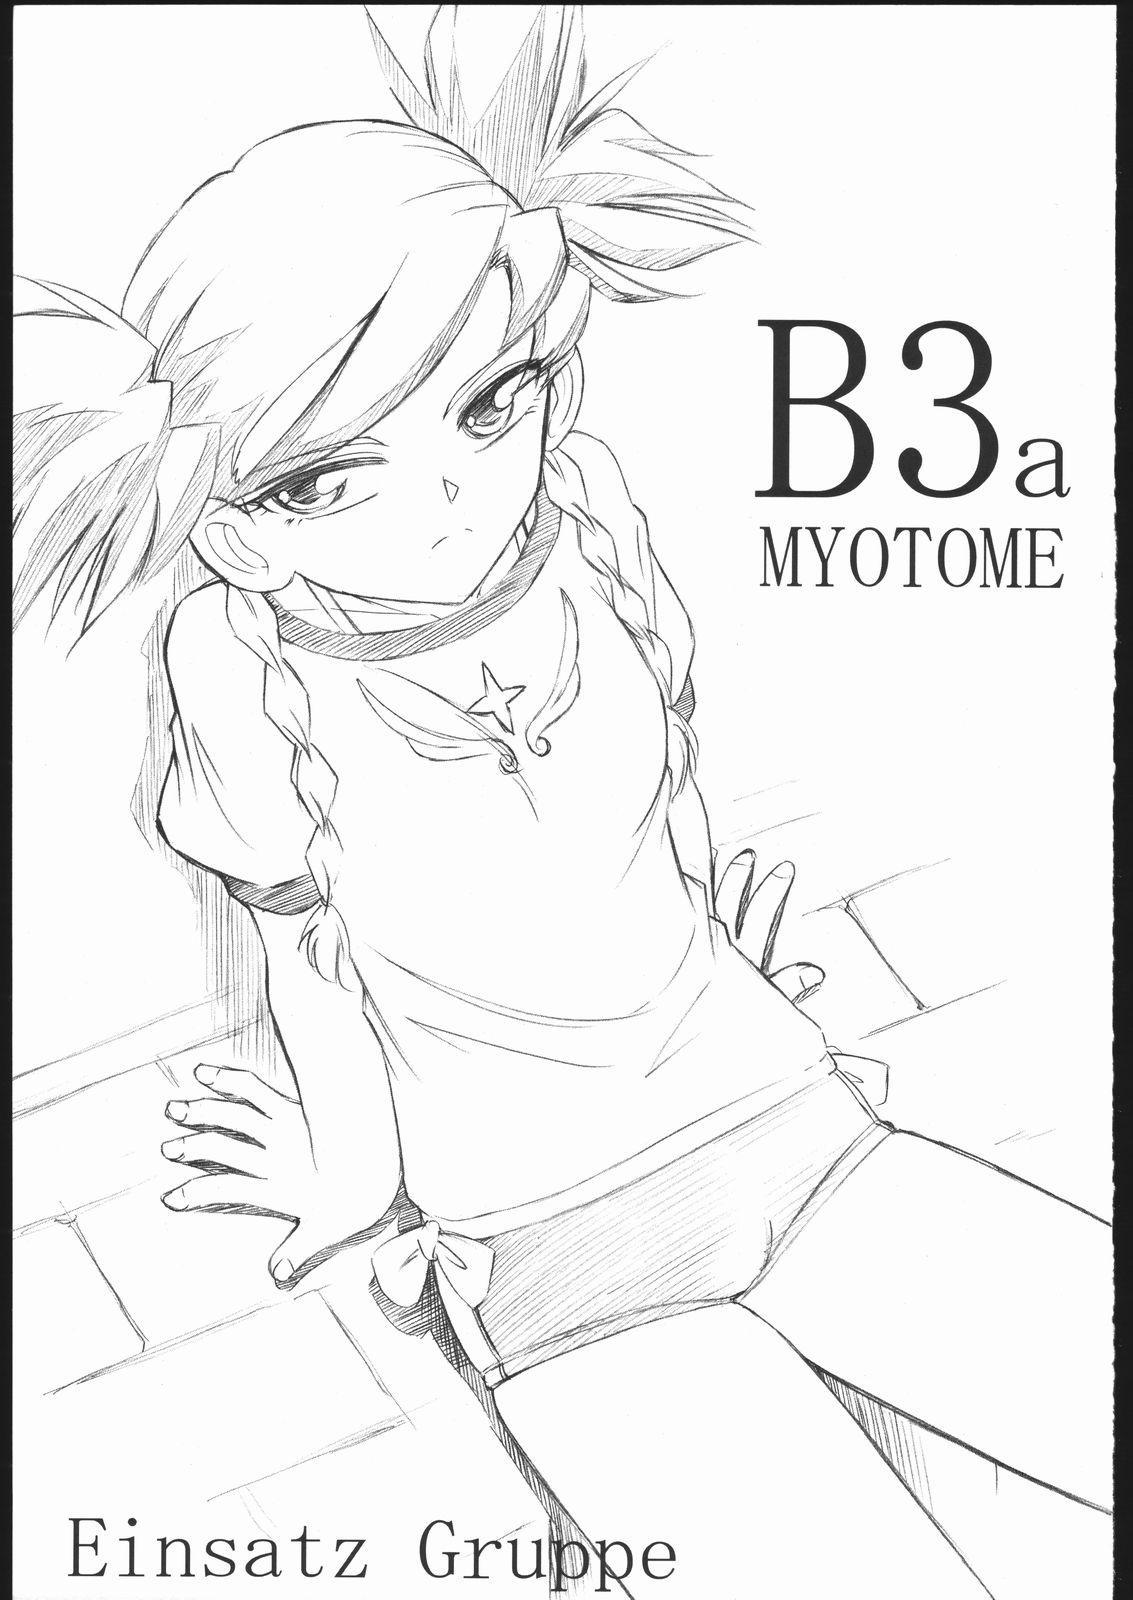 B3a MYOTOMO (C69) [EINSATZ GRUPPE (チャーリーにしなか)] (舞-乙HiME) 0